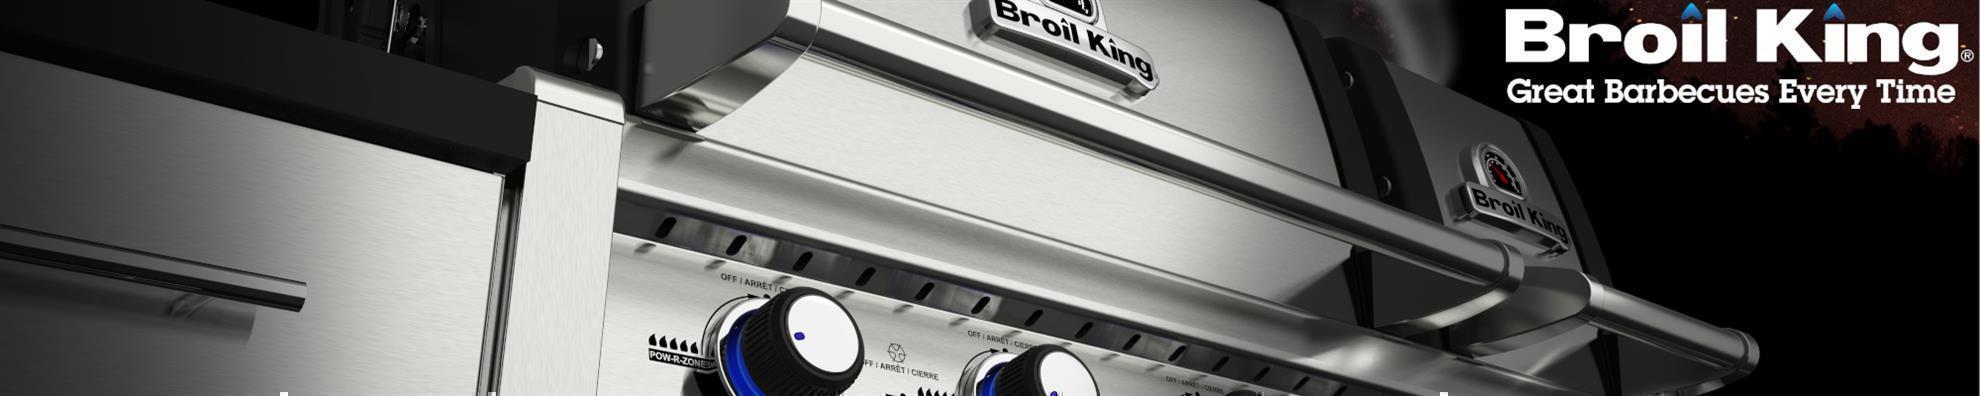 Broil King - GUSSPLATTE GEM™ SERIE, PORTA-CHEF™ 320